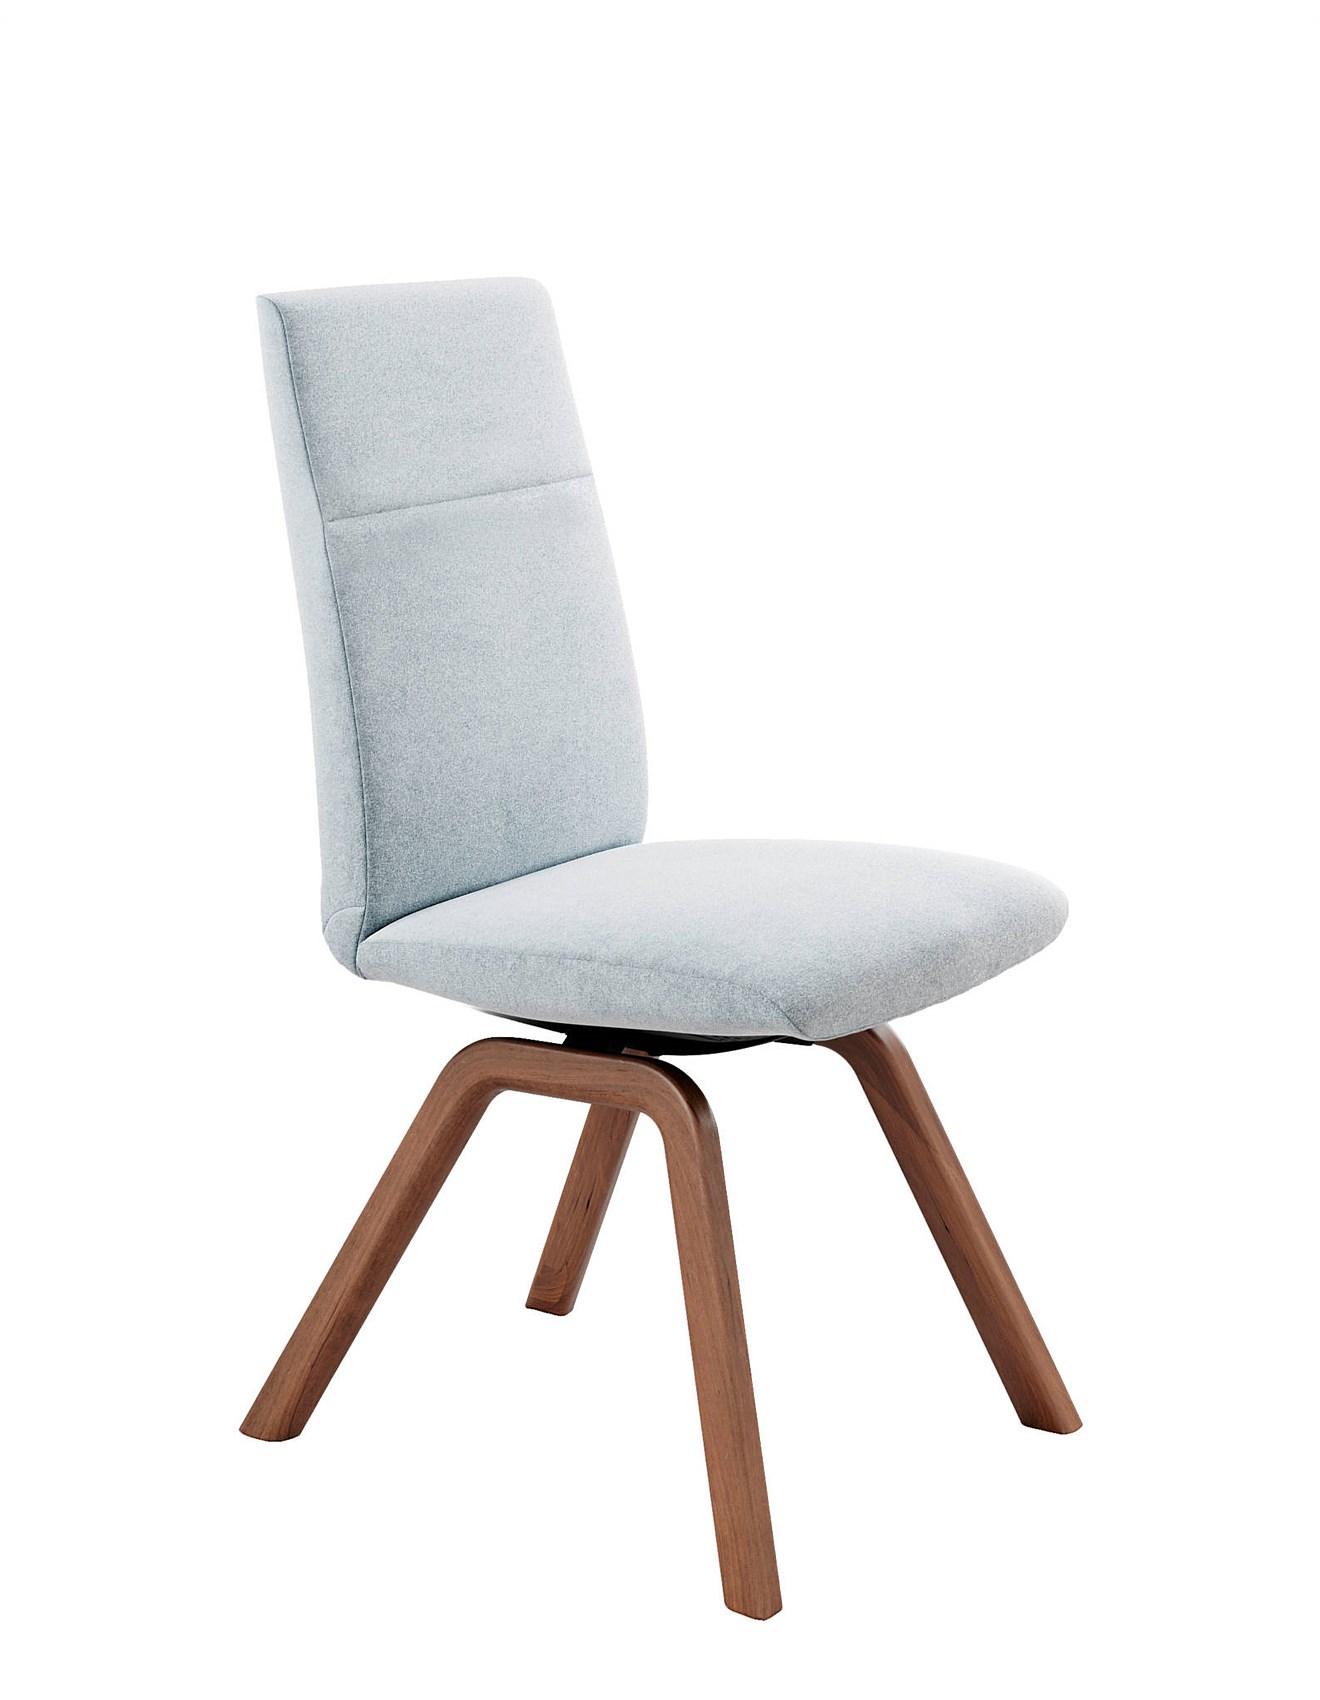 promo code f0dae d5da5 Stressless | Buy Stressless Chairs Online | David Jones ...